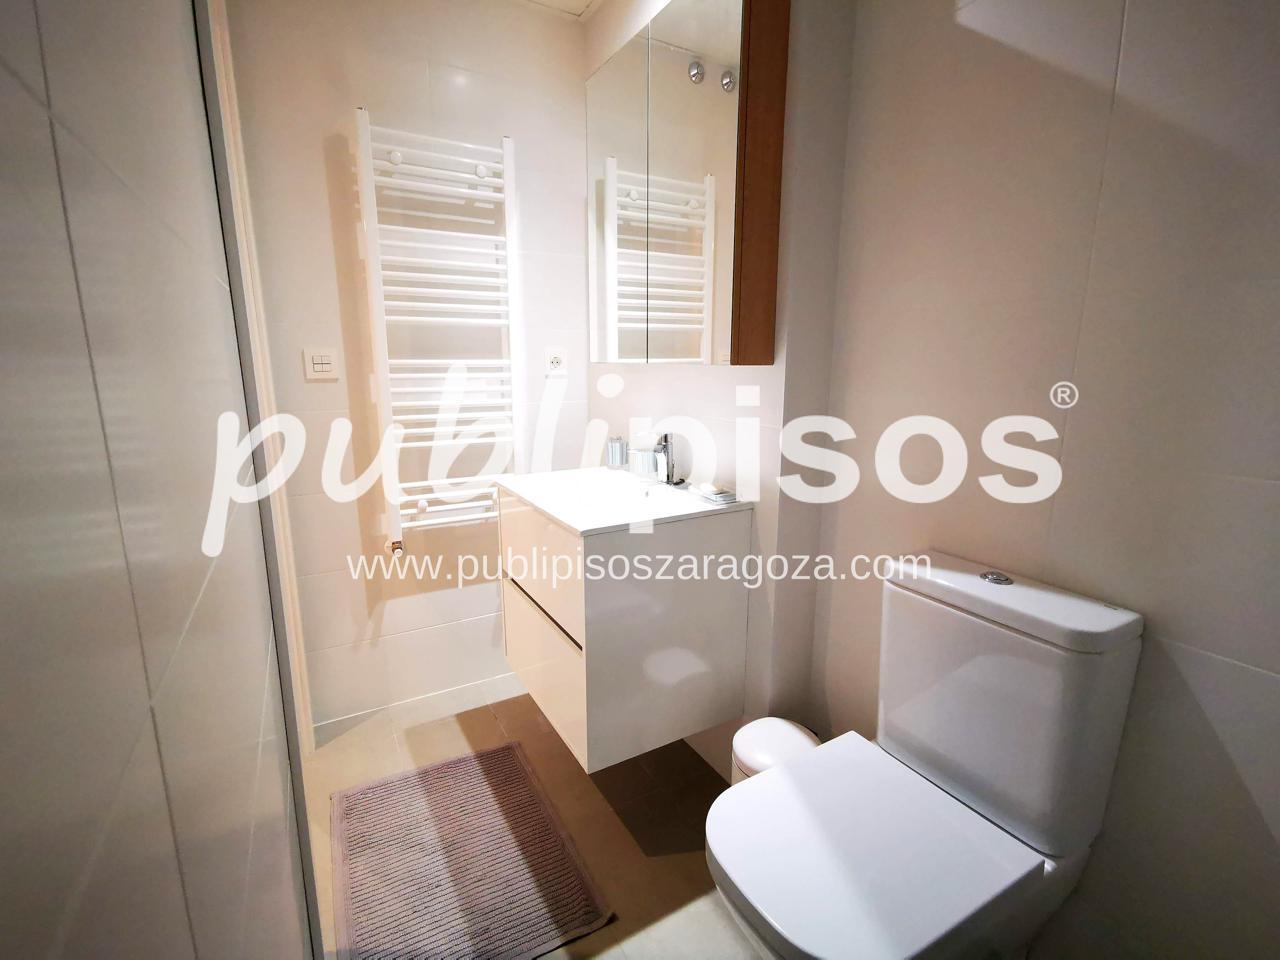 Piso obra nueva centro Zaragoza-11